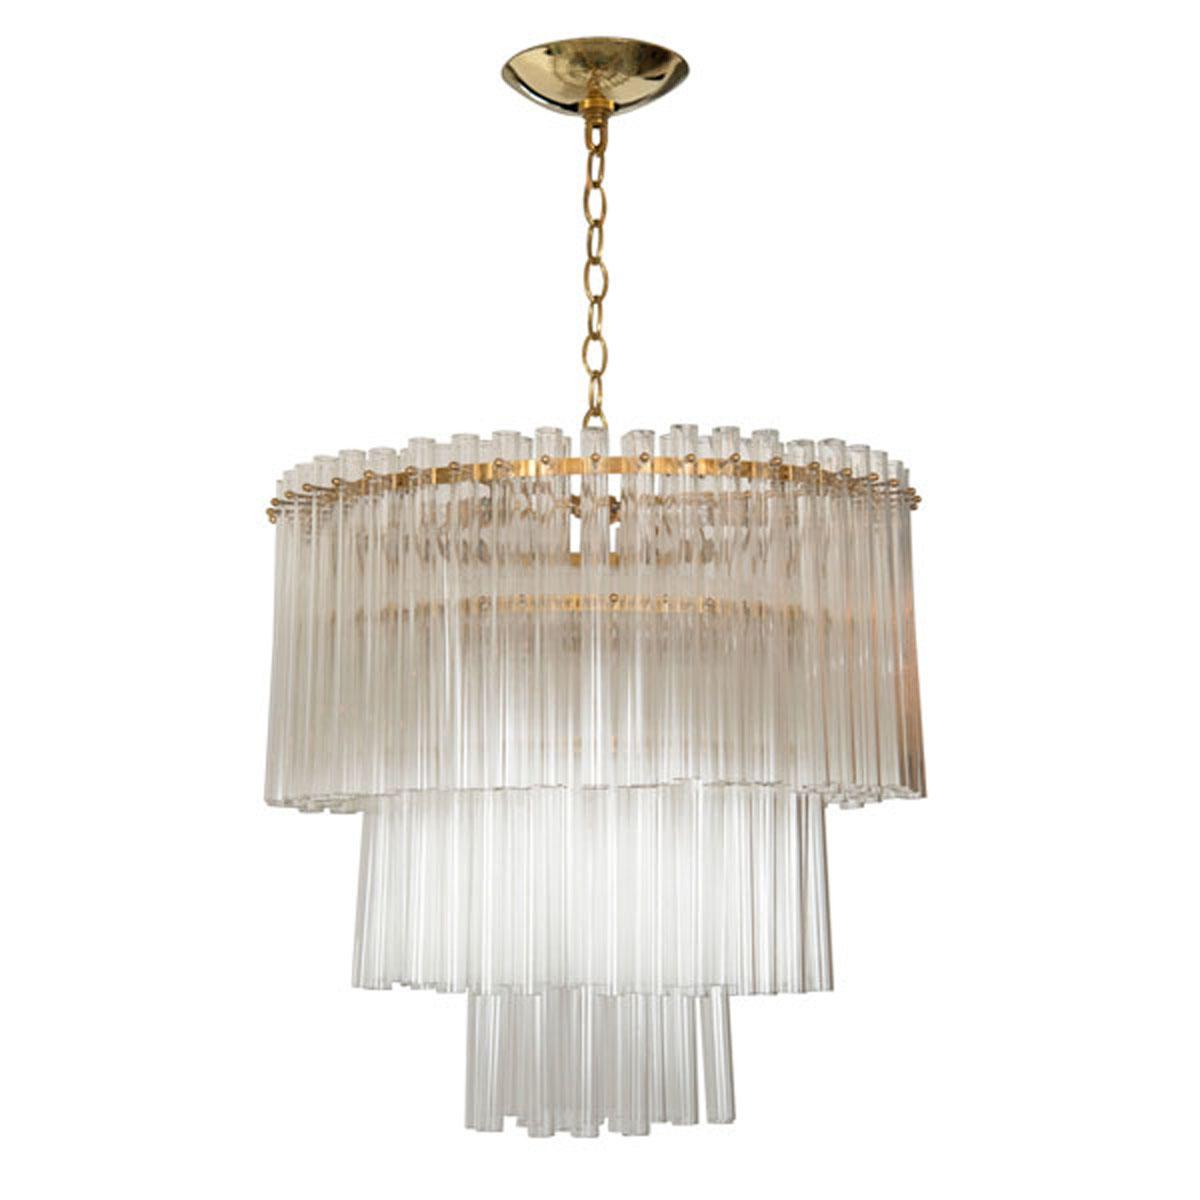 Circular three tier glass rod chandelier chandeliers pendants circular three tier glass rod chandelier chandeliers pendants john salibello audiocablefo